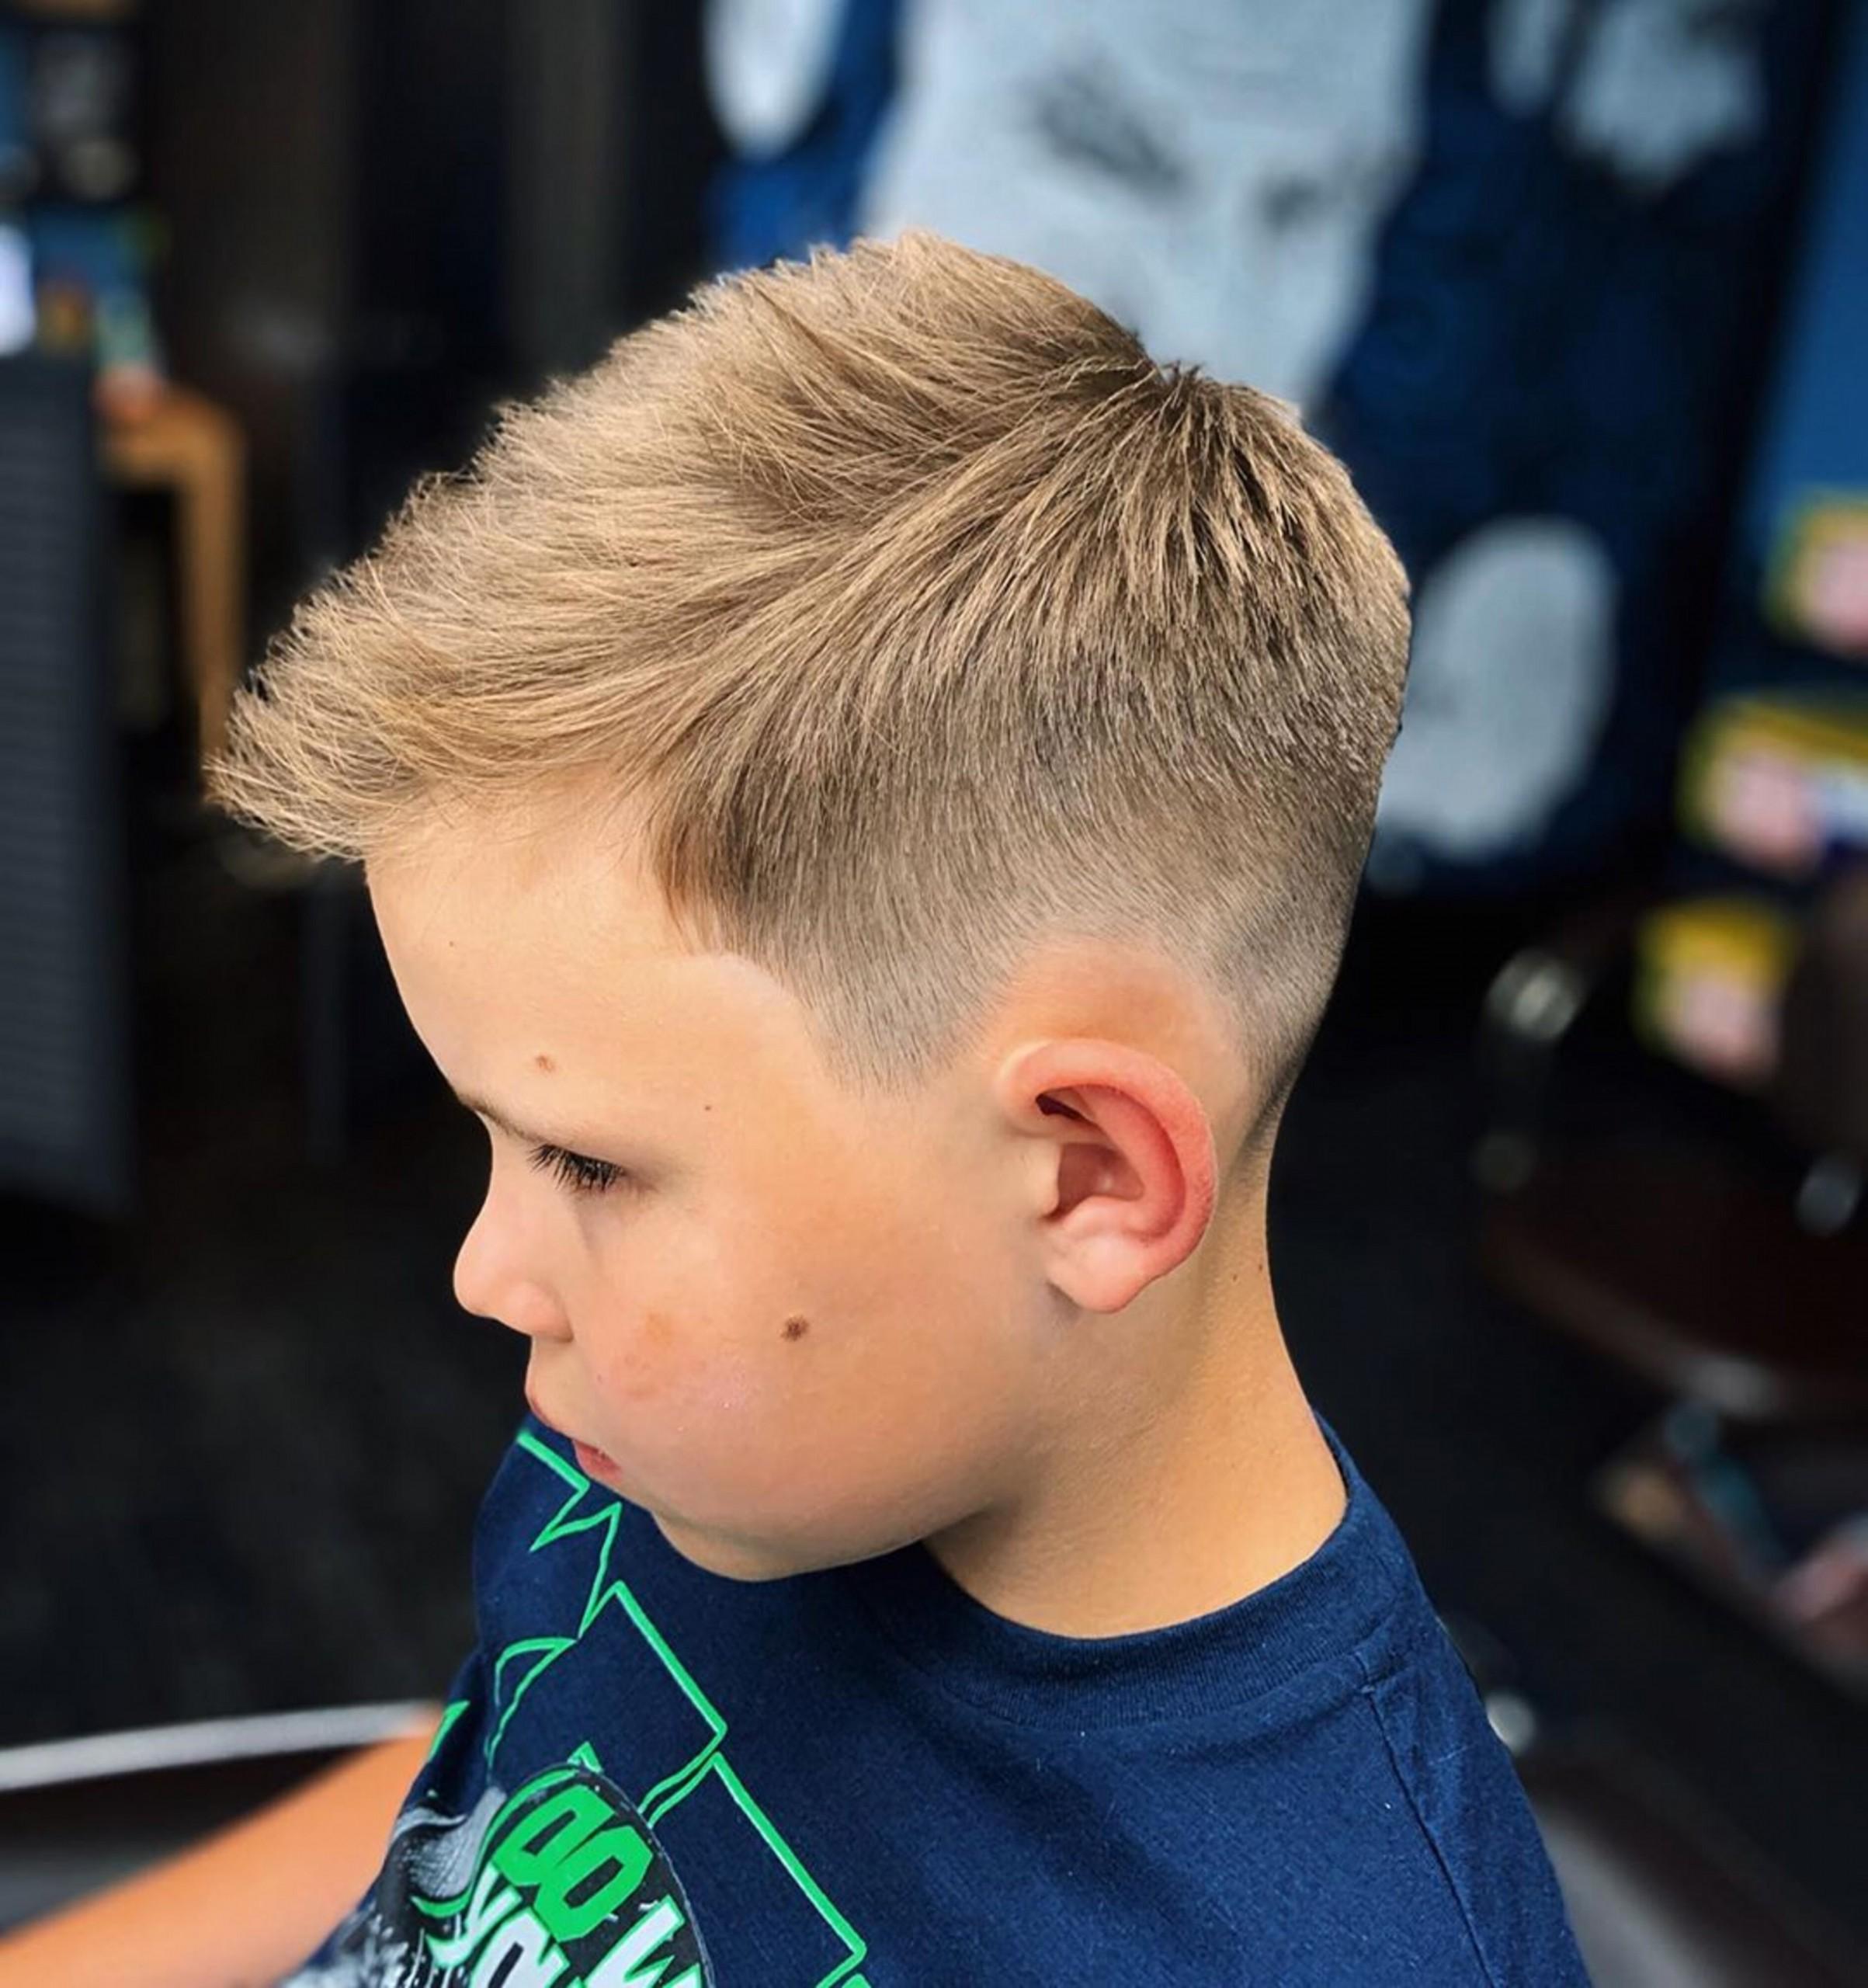 A fade haircut for little boys.